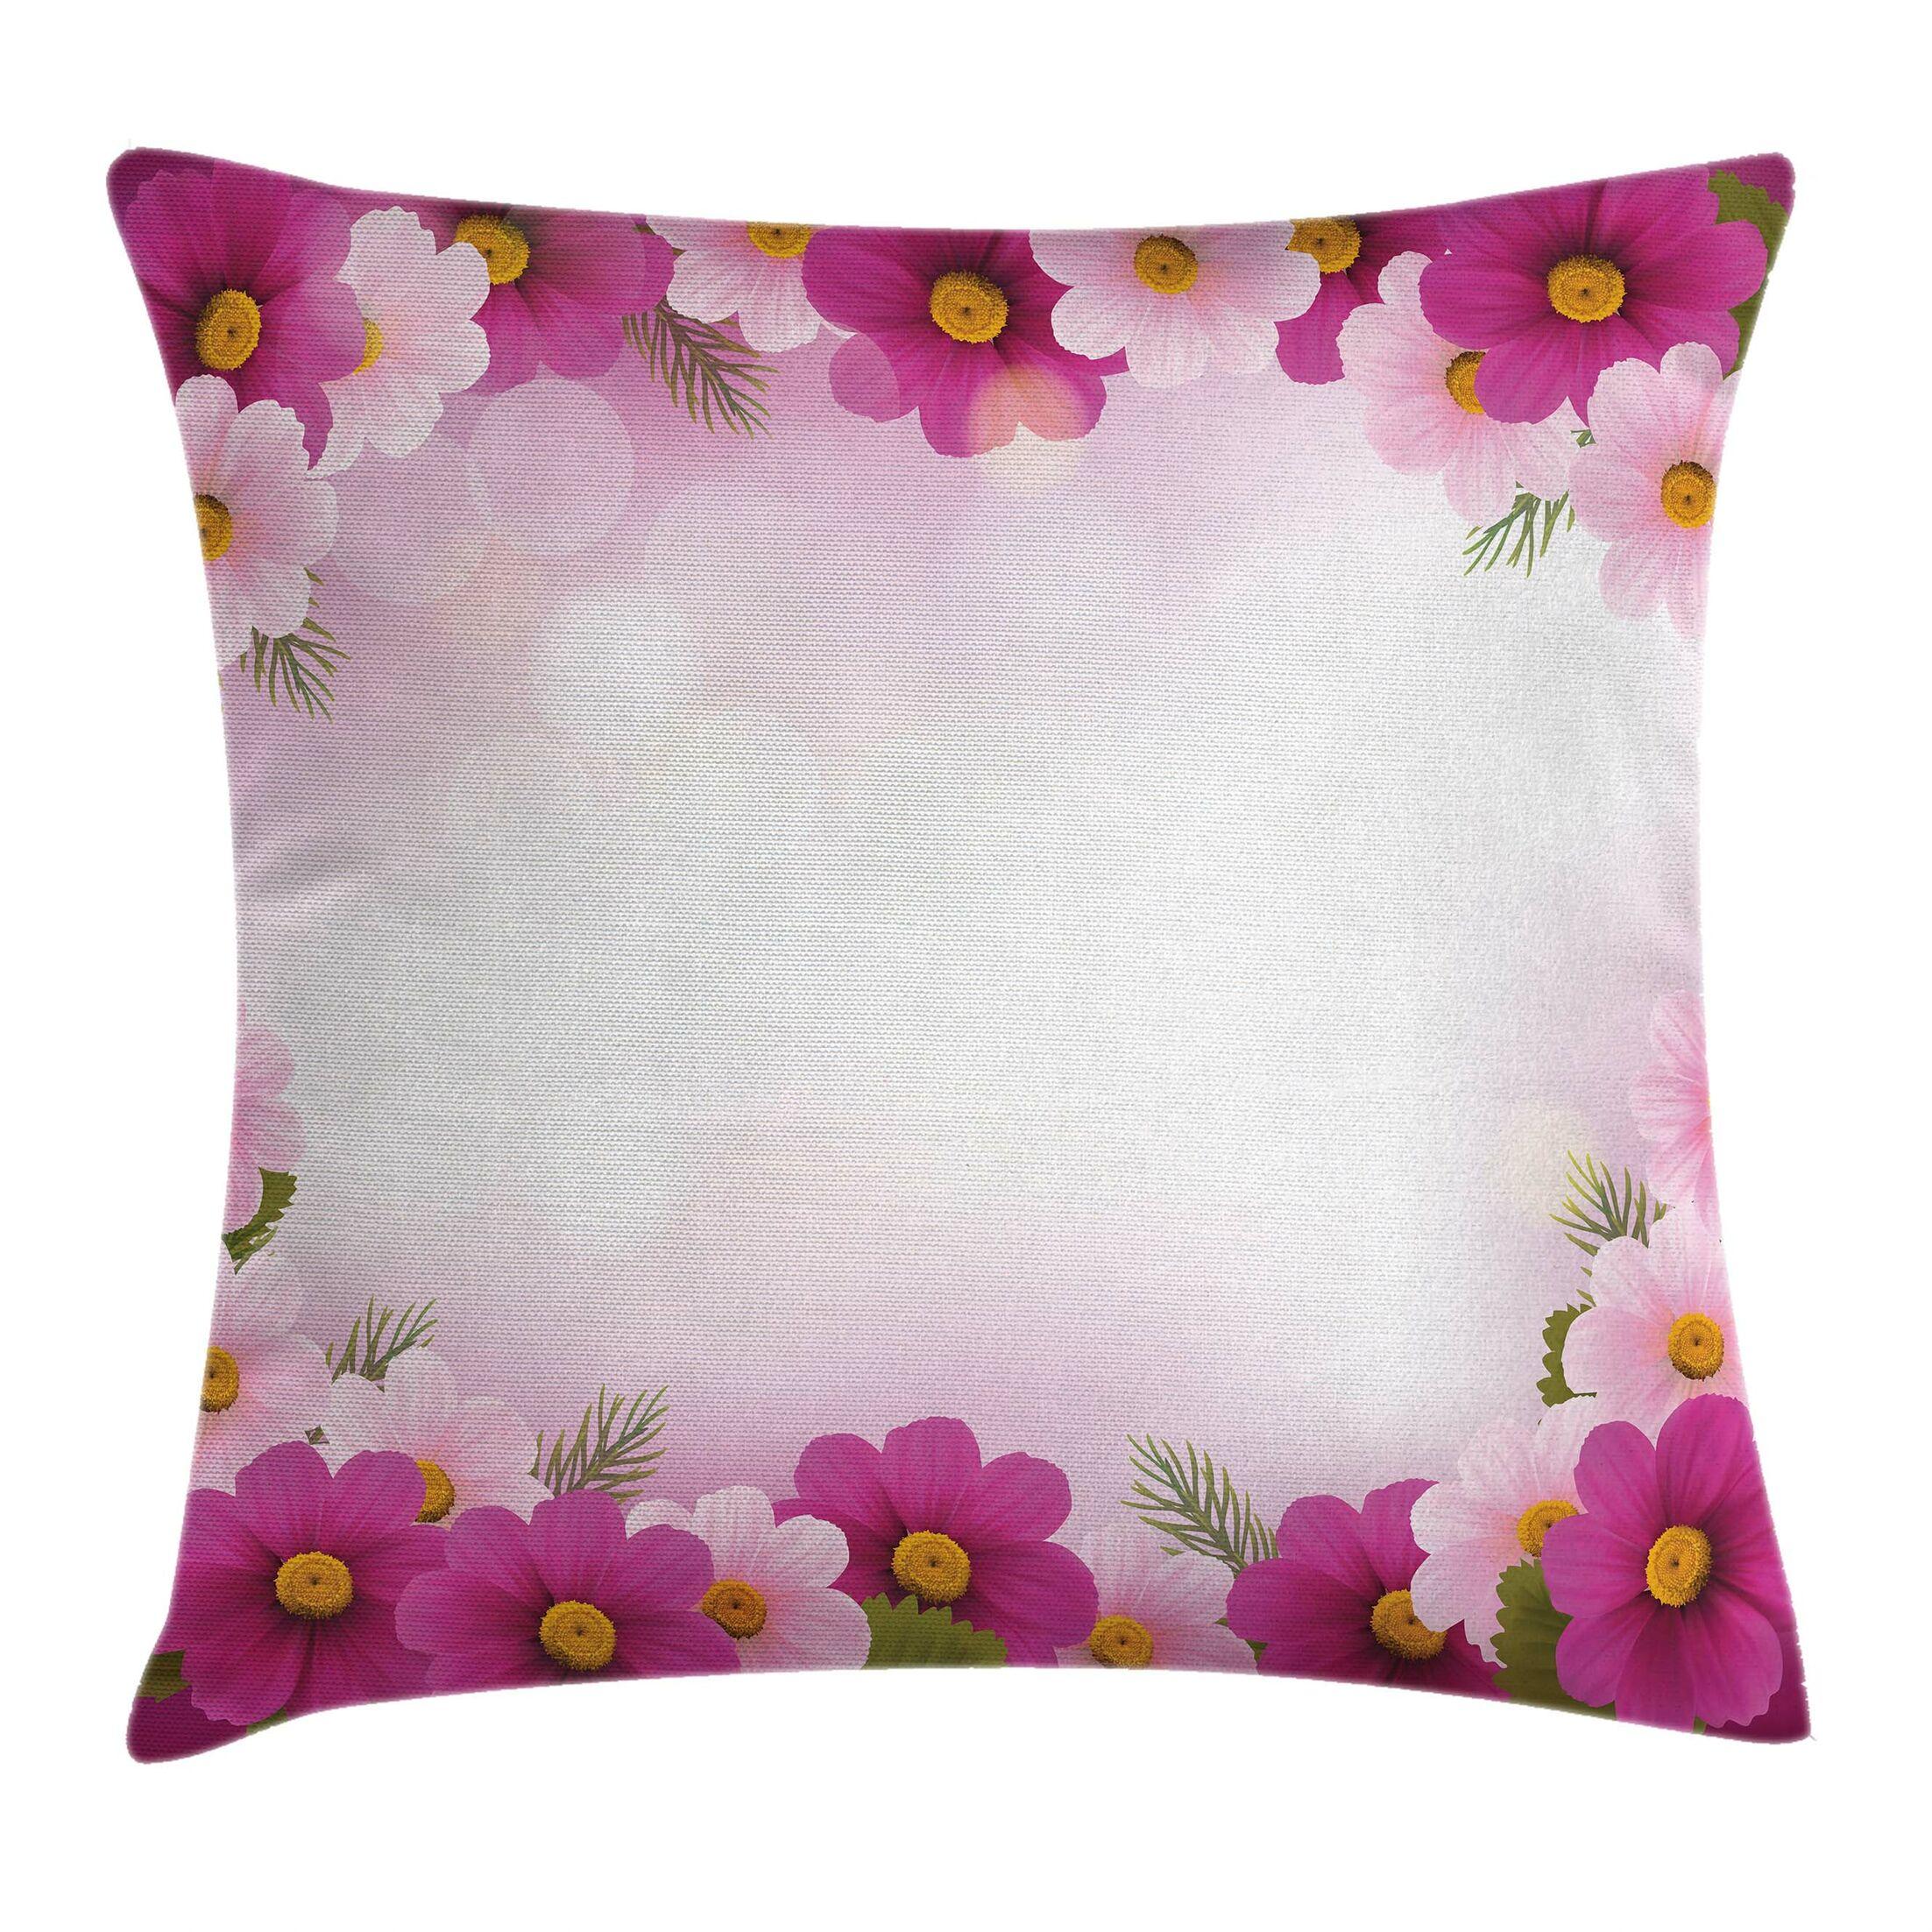 Romantic Daisies Framework Pillow Cover Size: 20